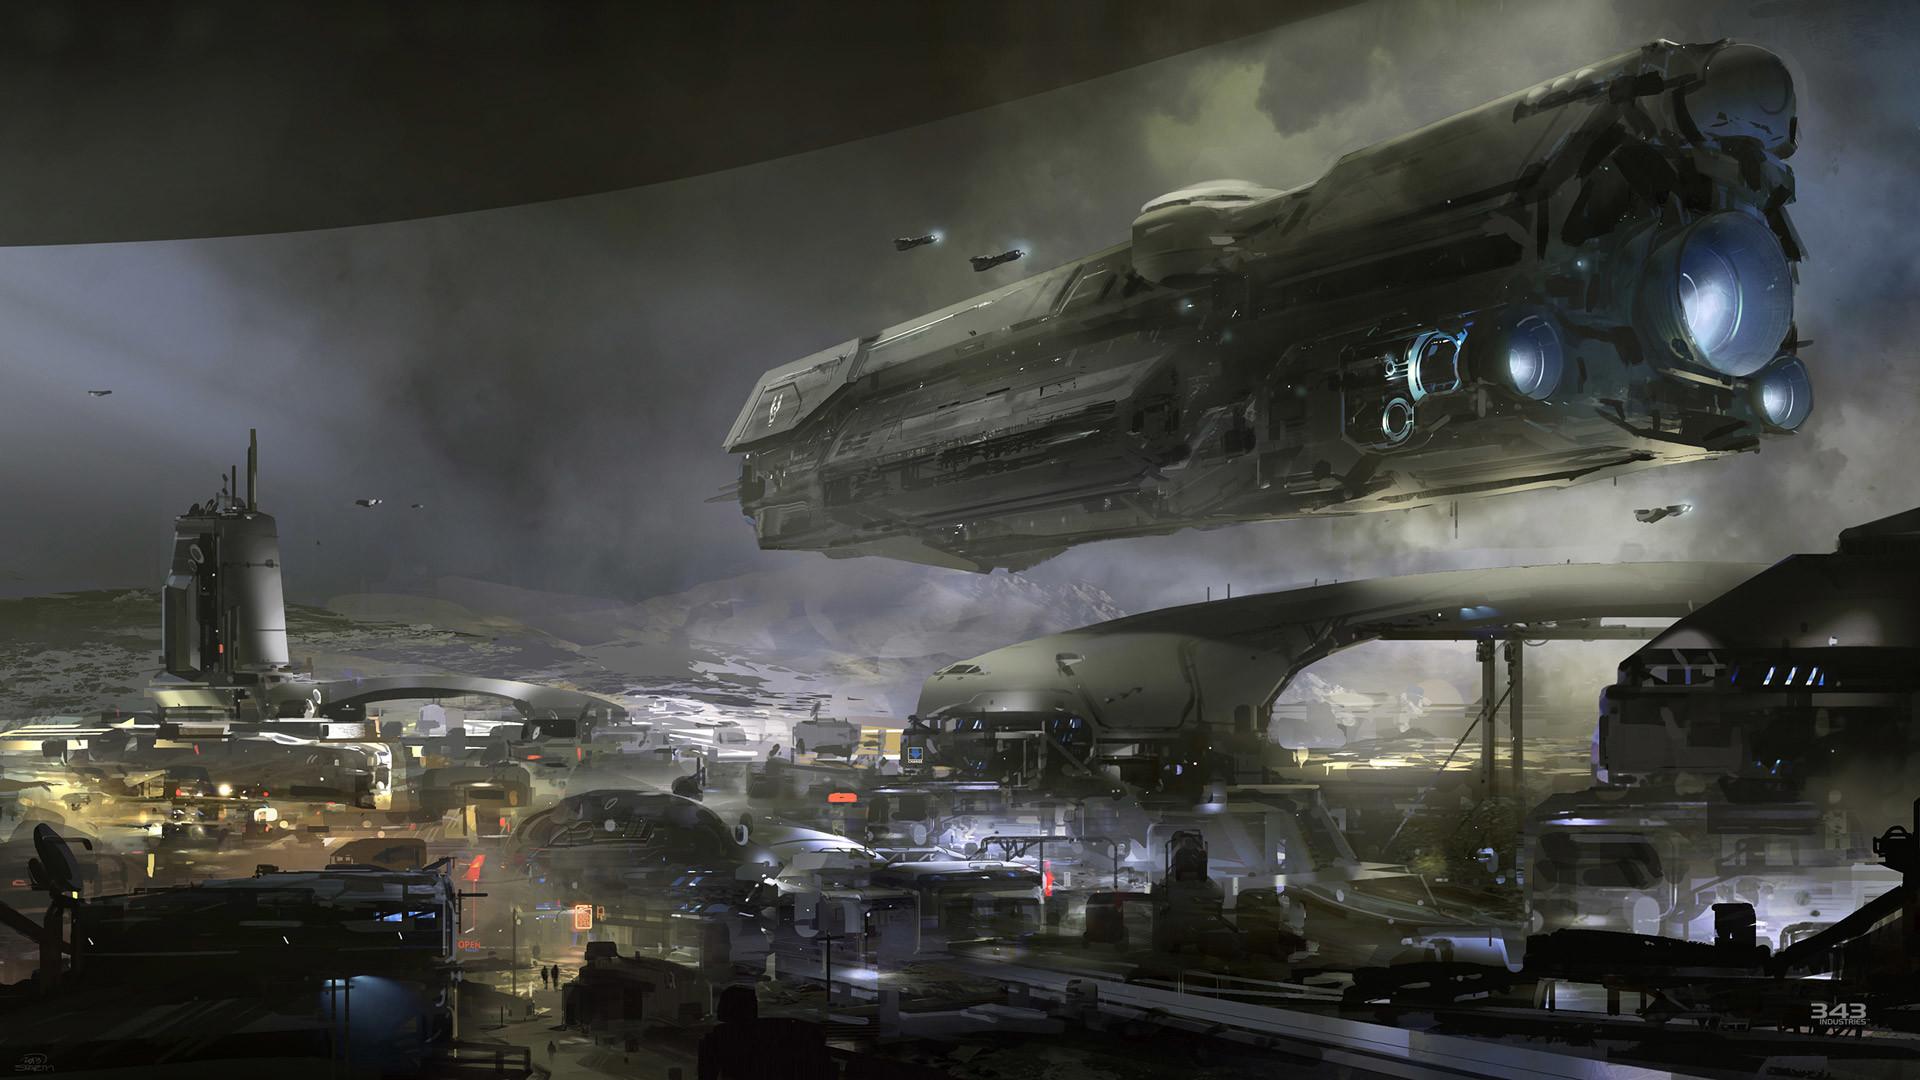 Halo 5 Wallpaper Xbox One